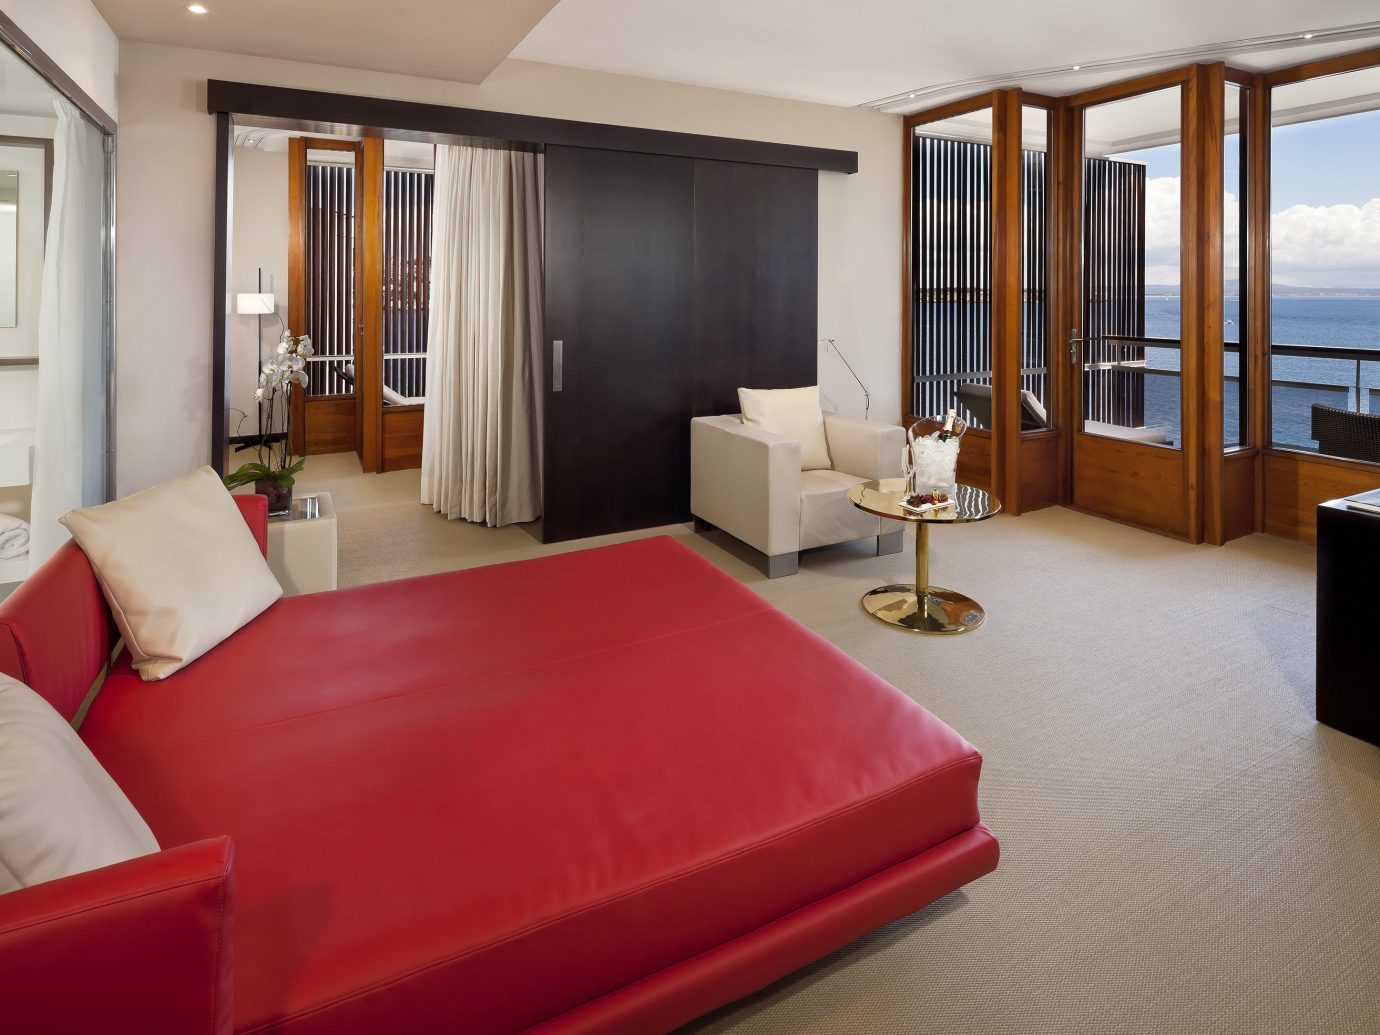 Hotels indoor floor sofa room wall window red property hotel ceiling Suite bed real estate interior design estate living room furniture apartment condominium cottage Bedroom Villa area Modern flat